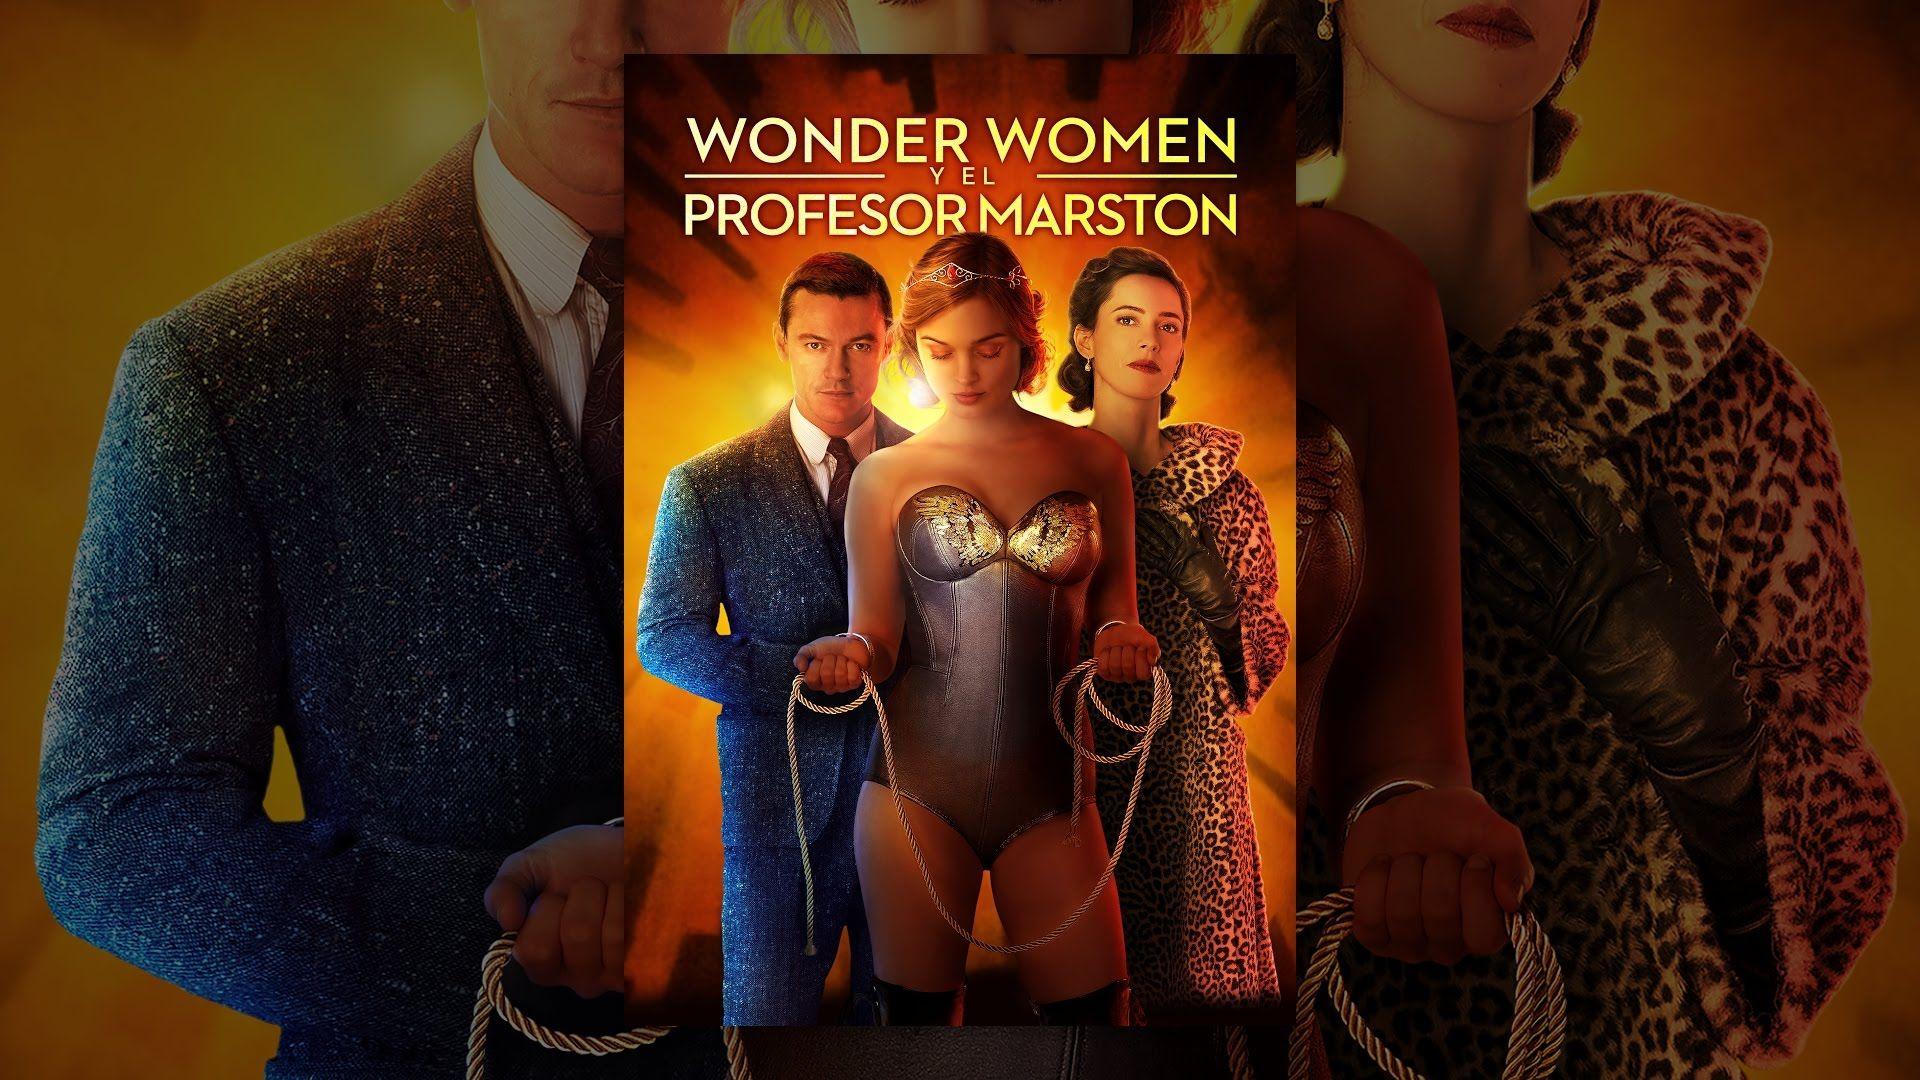 Wonder Women Y El Profesor Marston Mujer Maravilla Lindy Hop Luke Evans